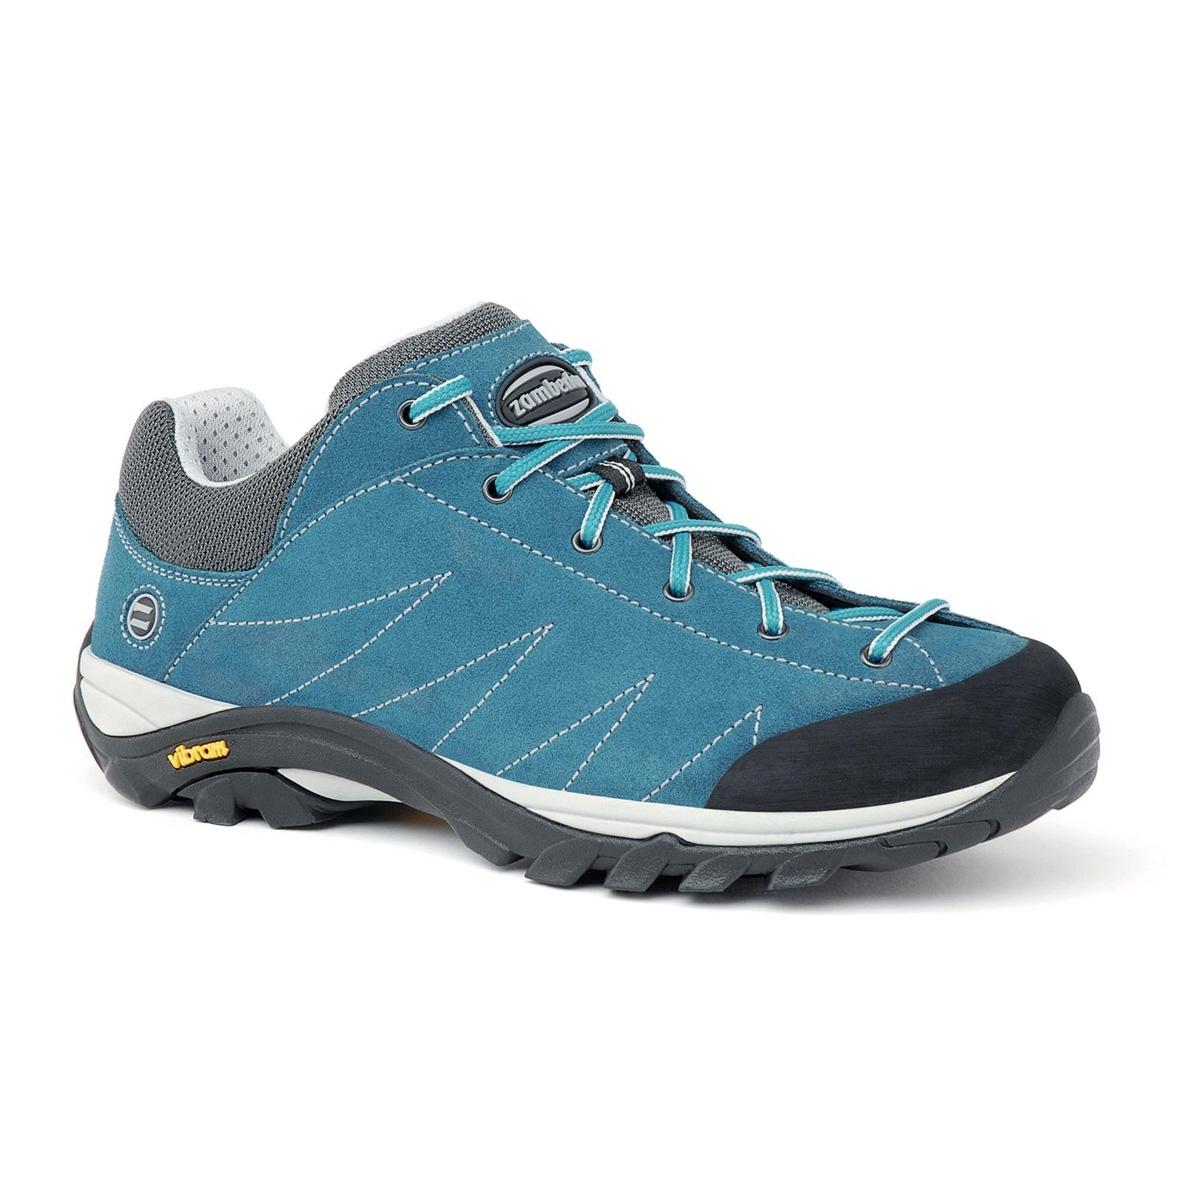 a44f58f7bfd Zamberlan 103 Hike Lite RR WNS Walking Shoes (Men's) - Octane